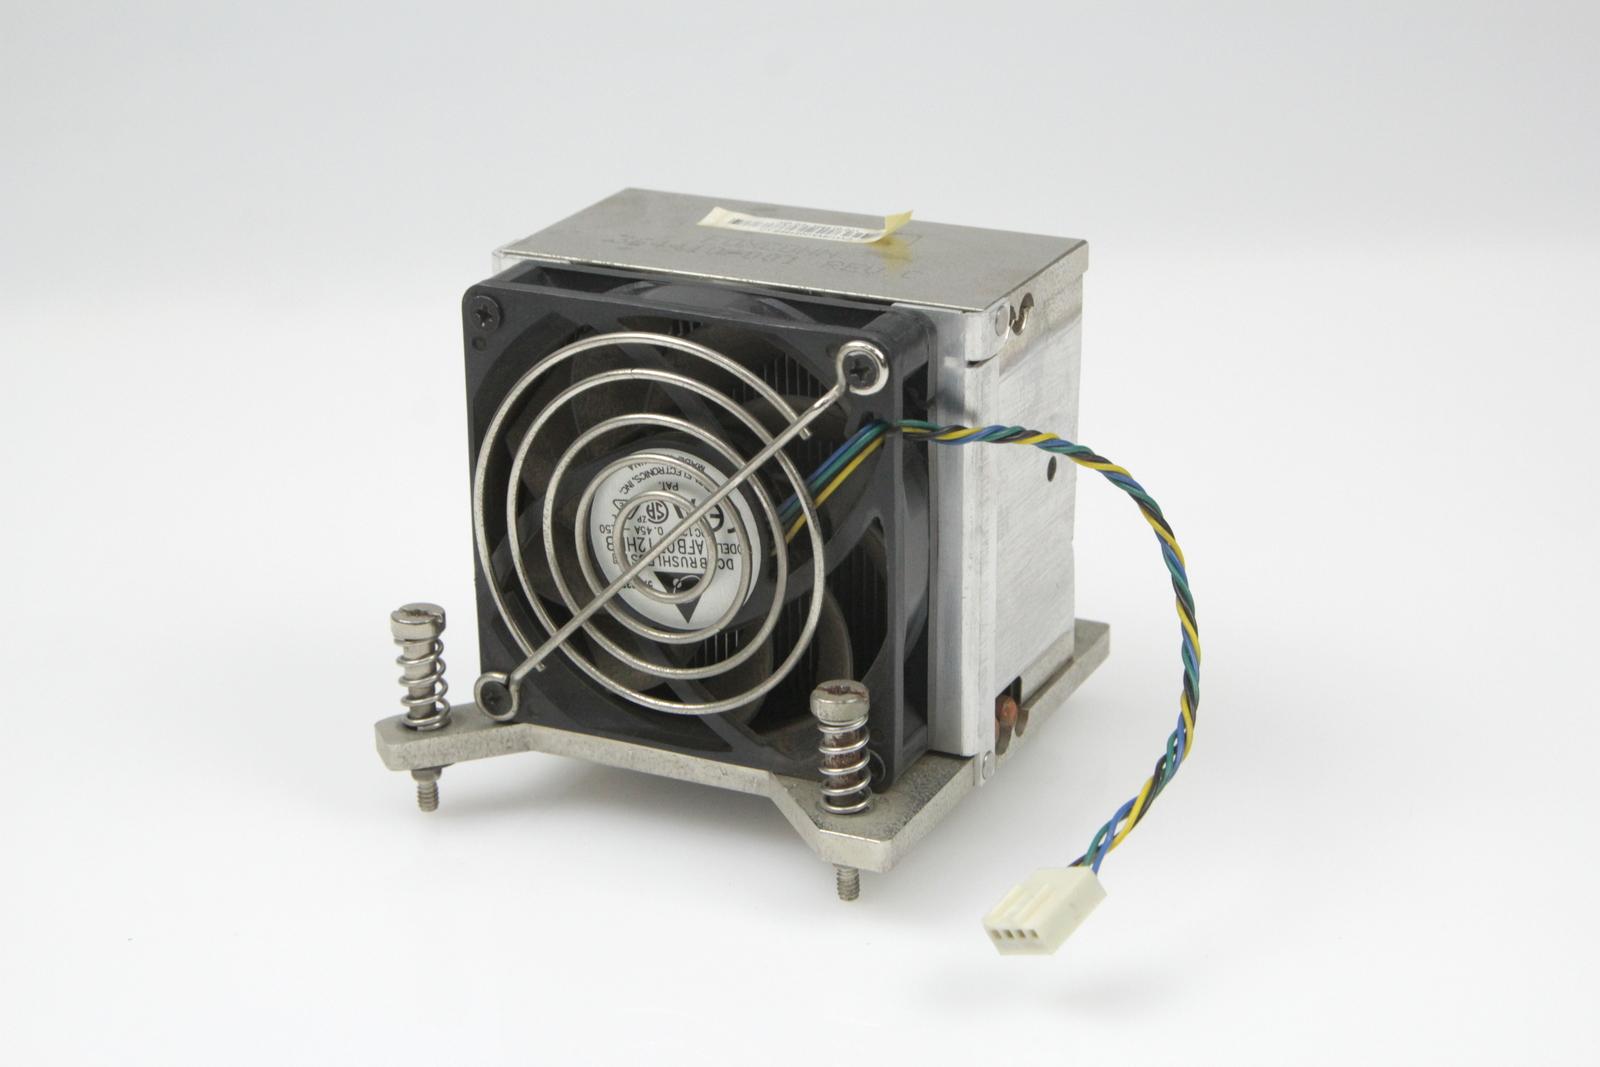 HP DC5100 DC7100 Heatsink and Cooling Fan 364410-001